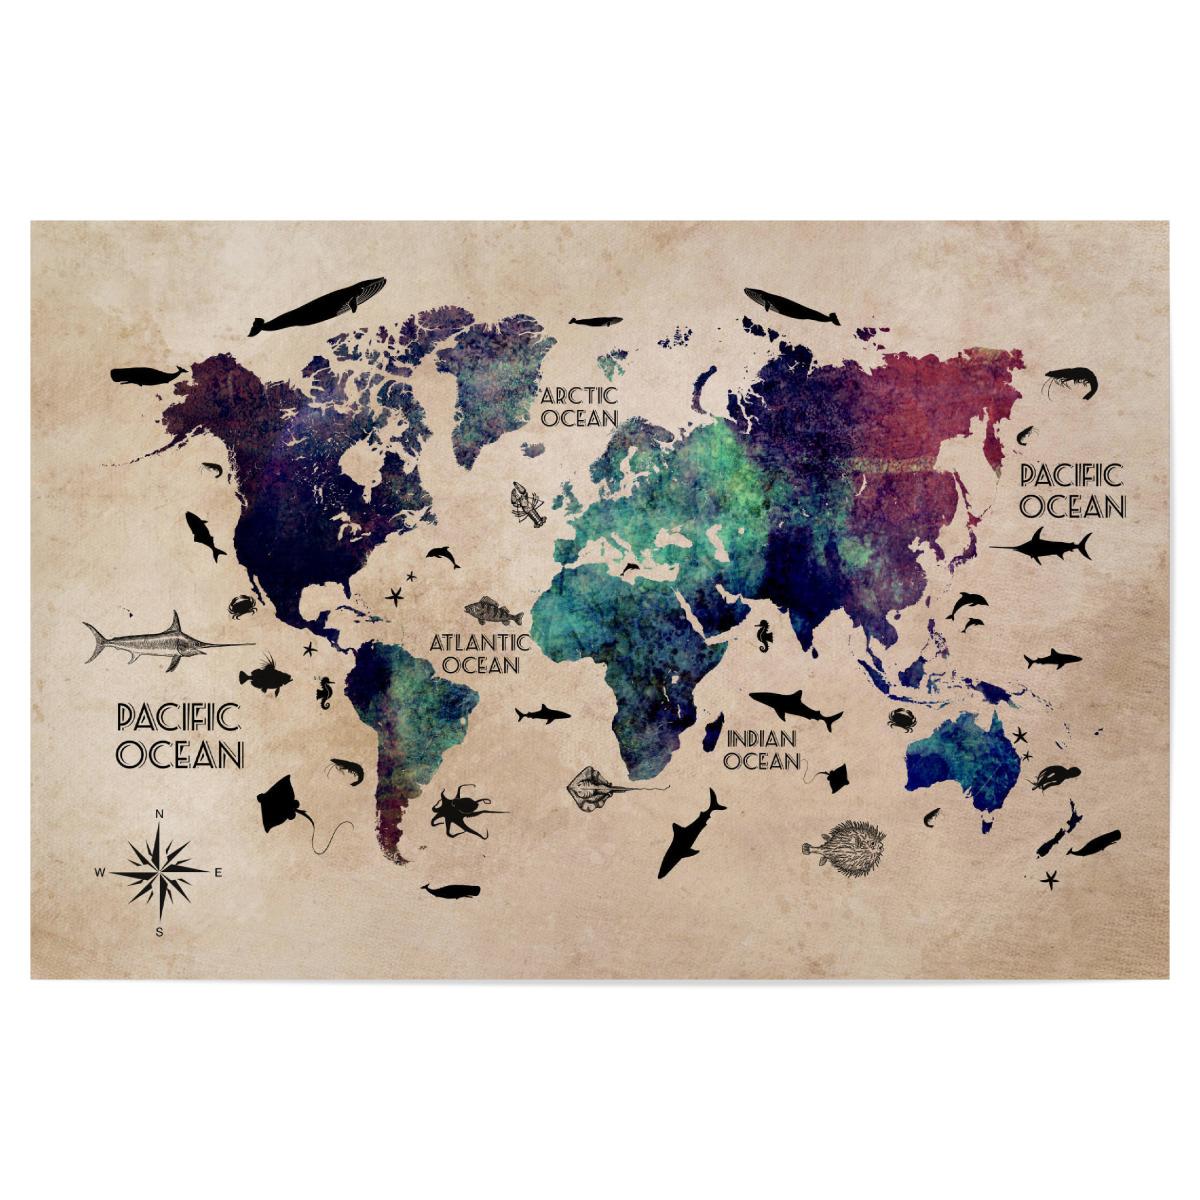 world map 26 text als Poster bei artboxONE kaufen